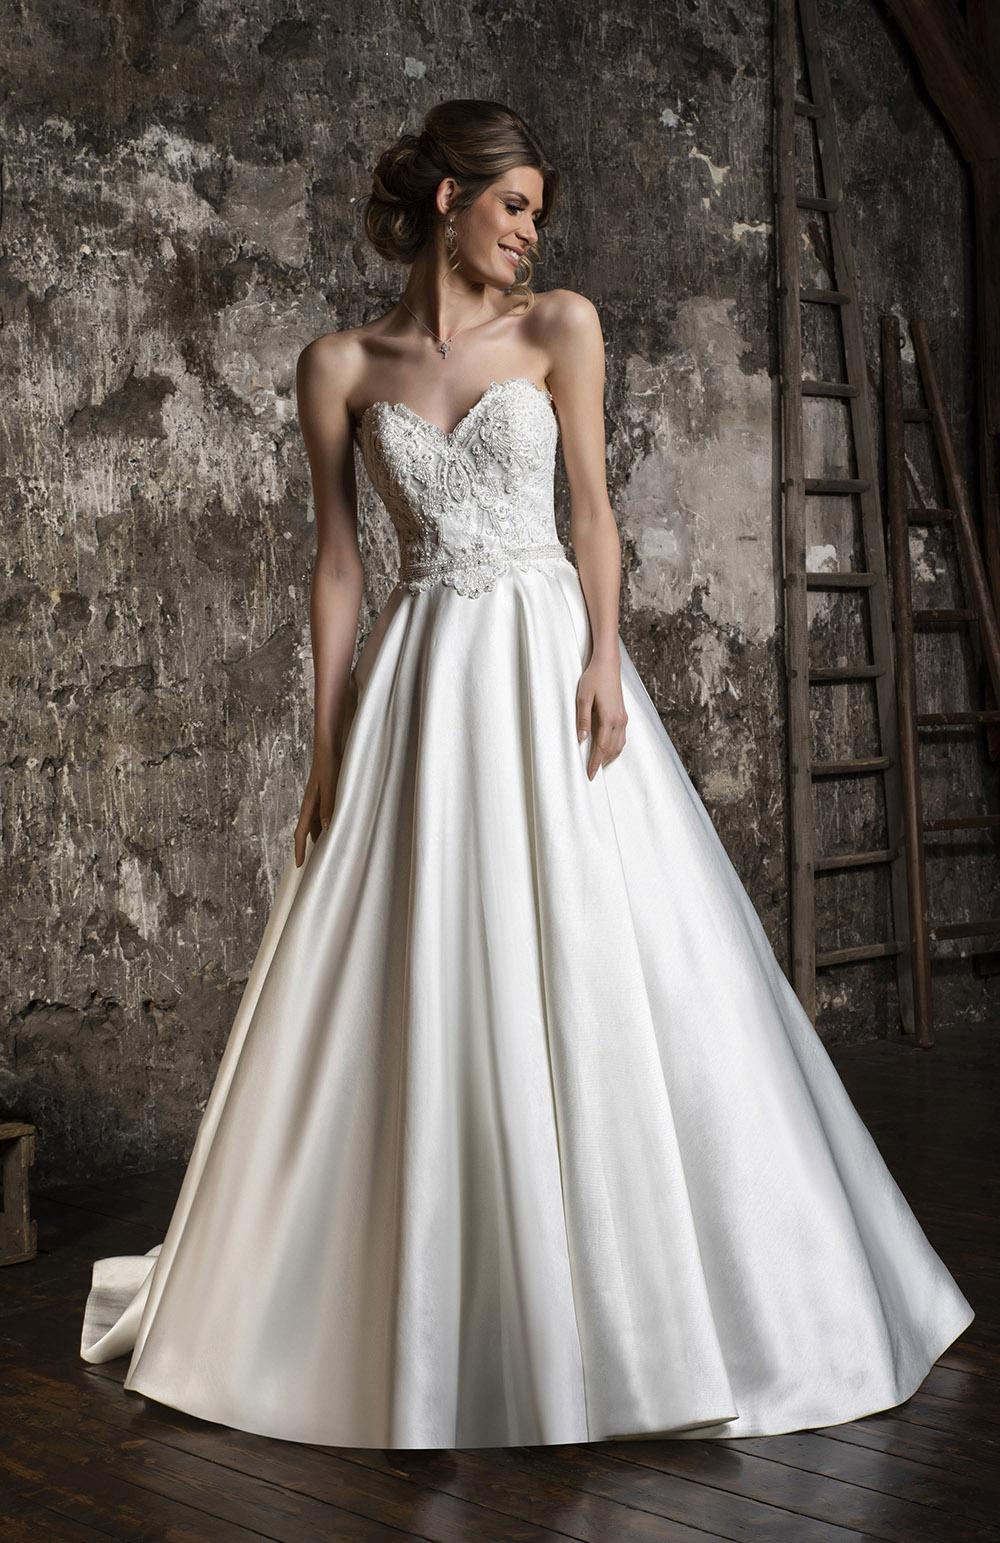 Robe de mariée Modèle Catalina